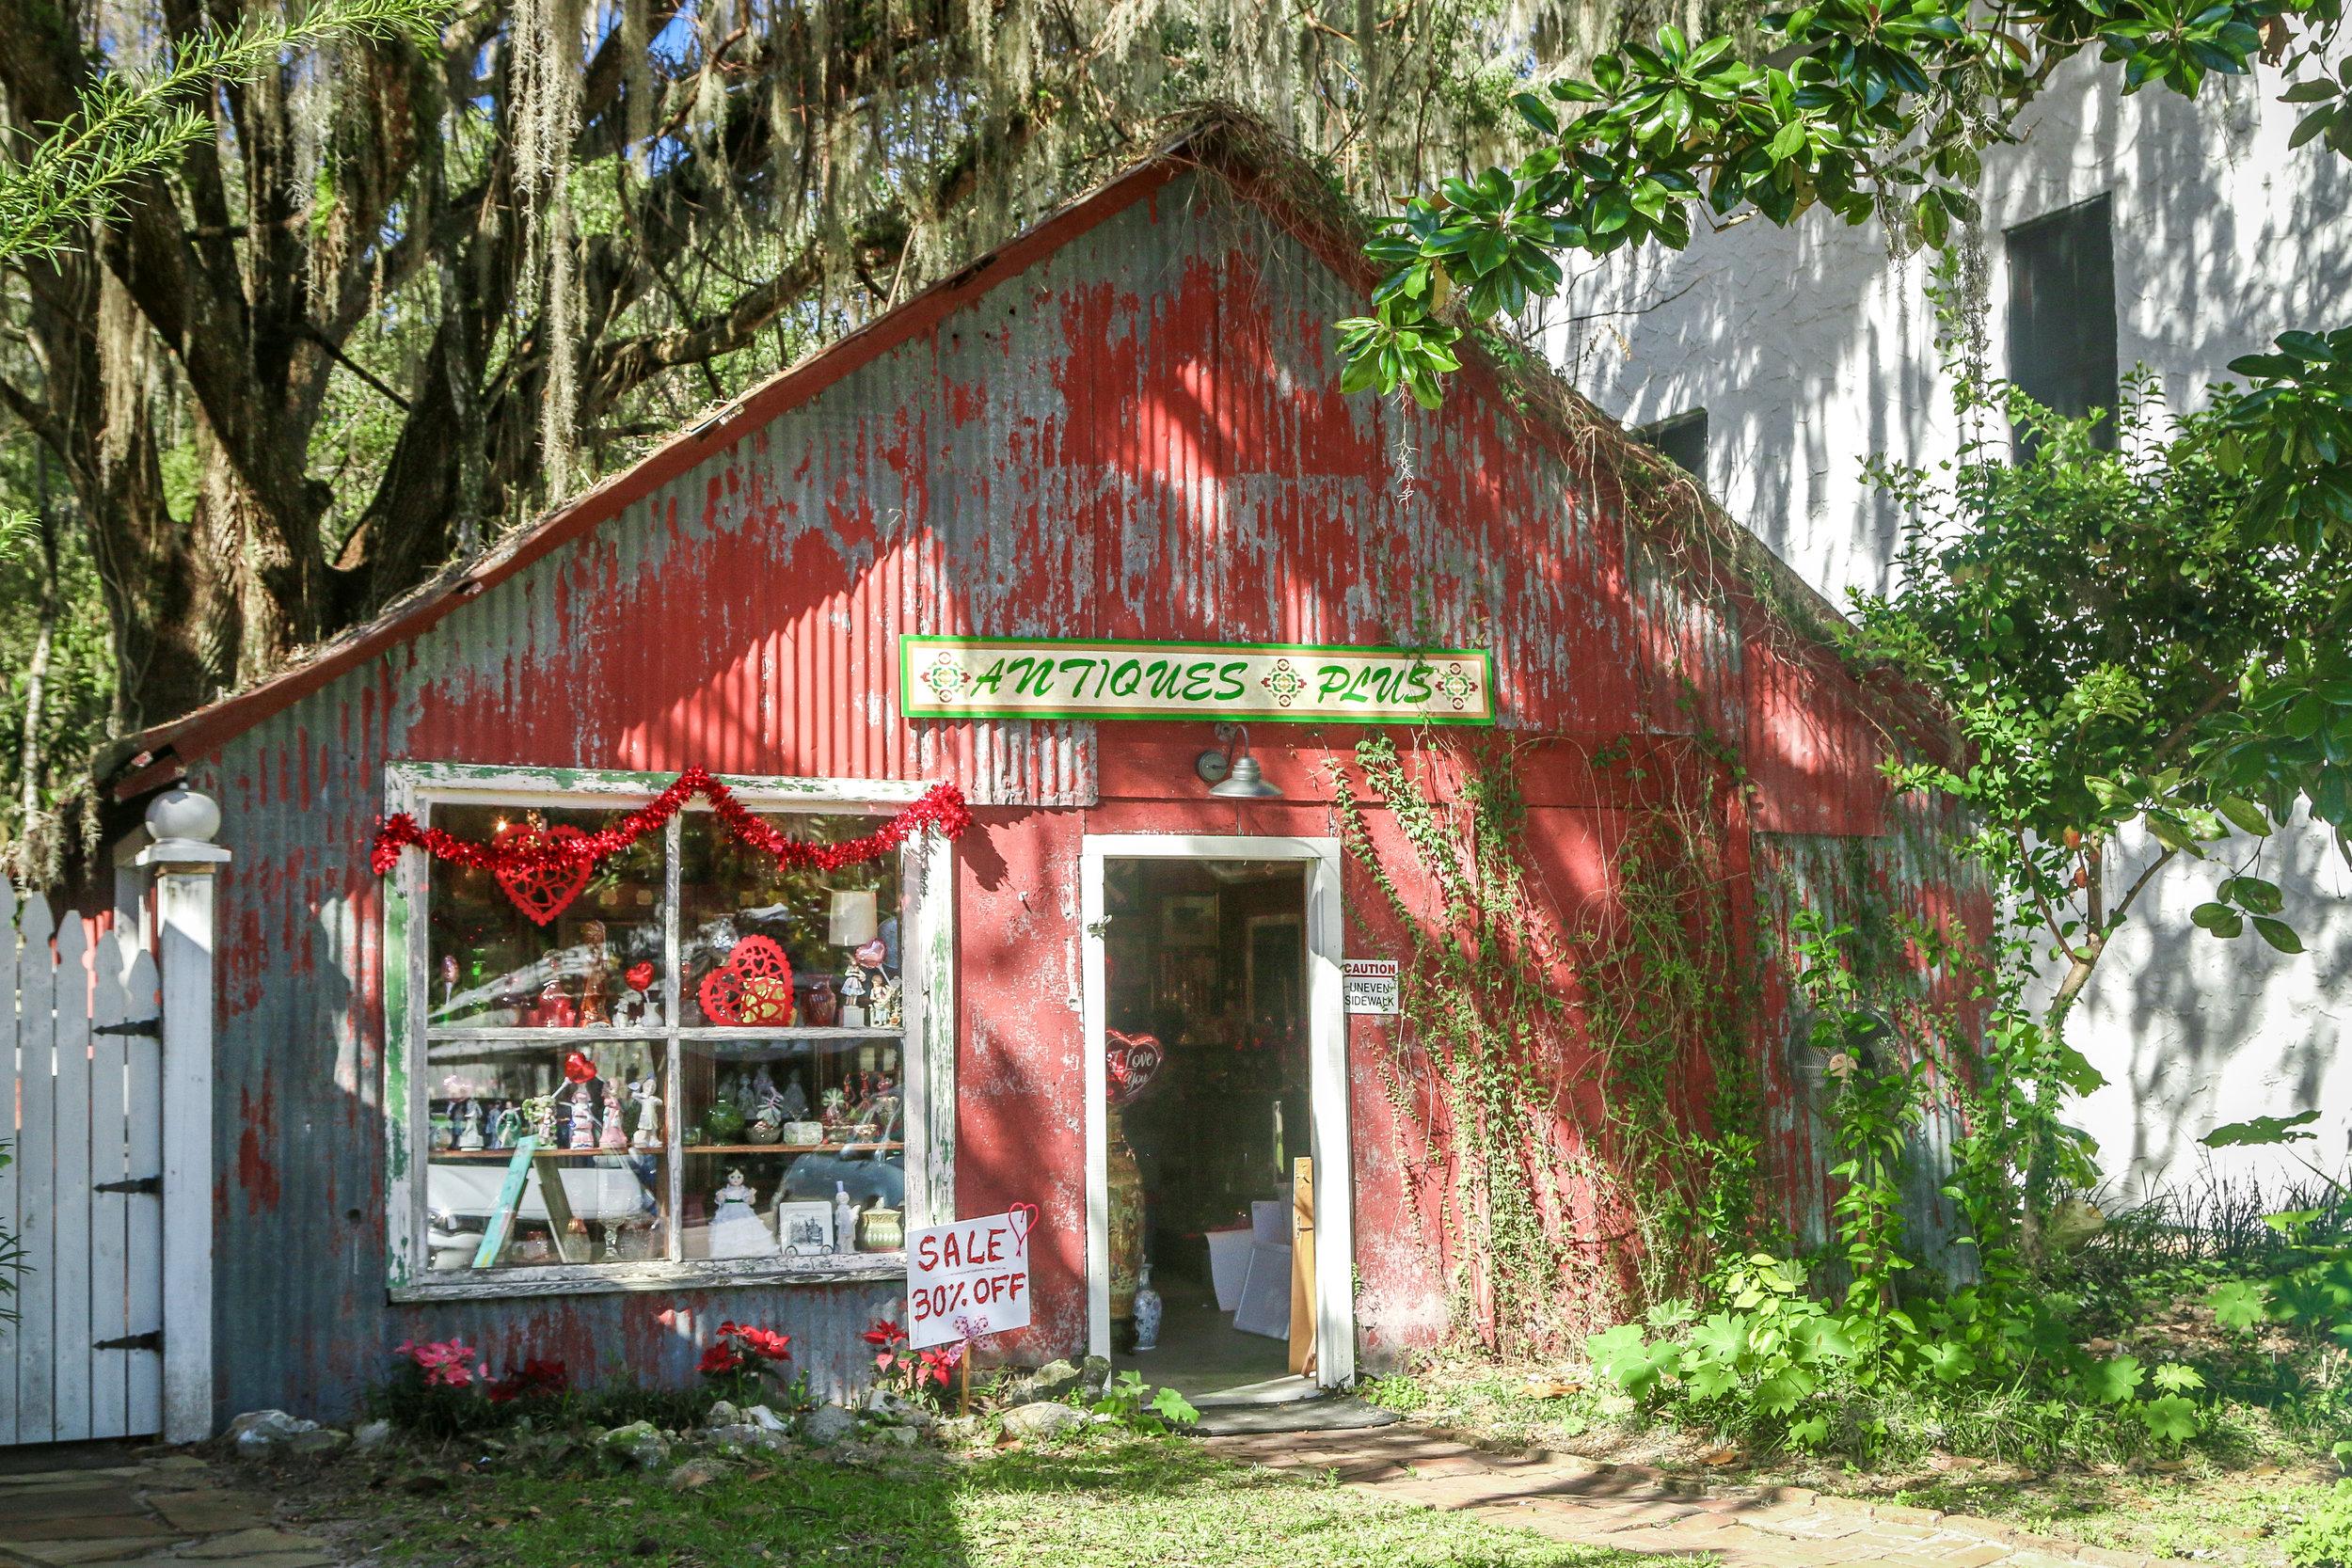 Micanopy Antique Store